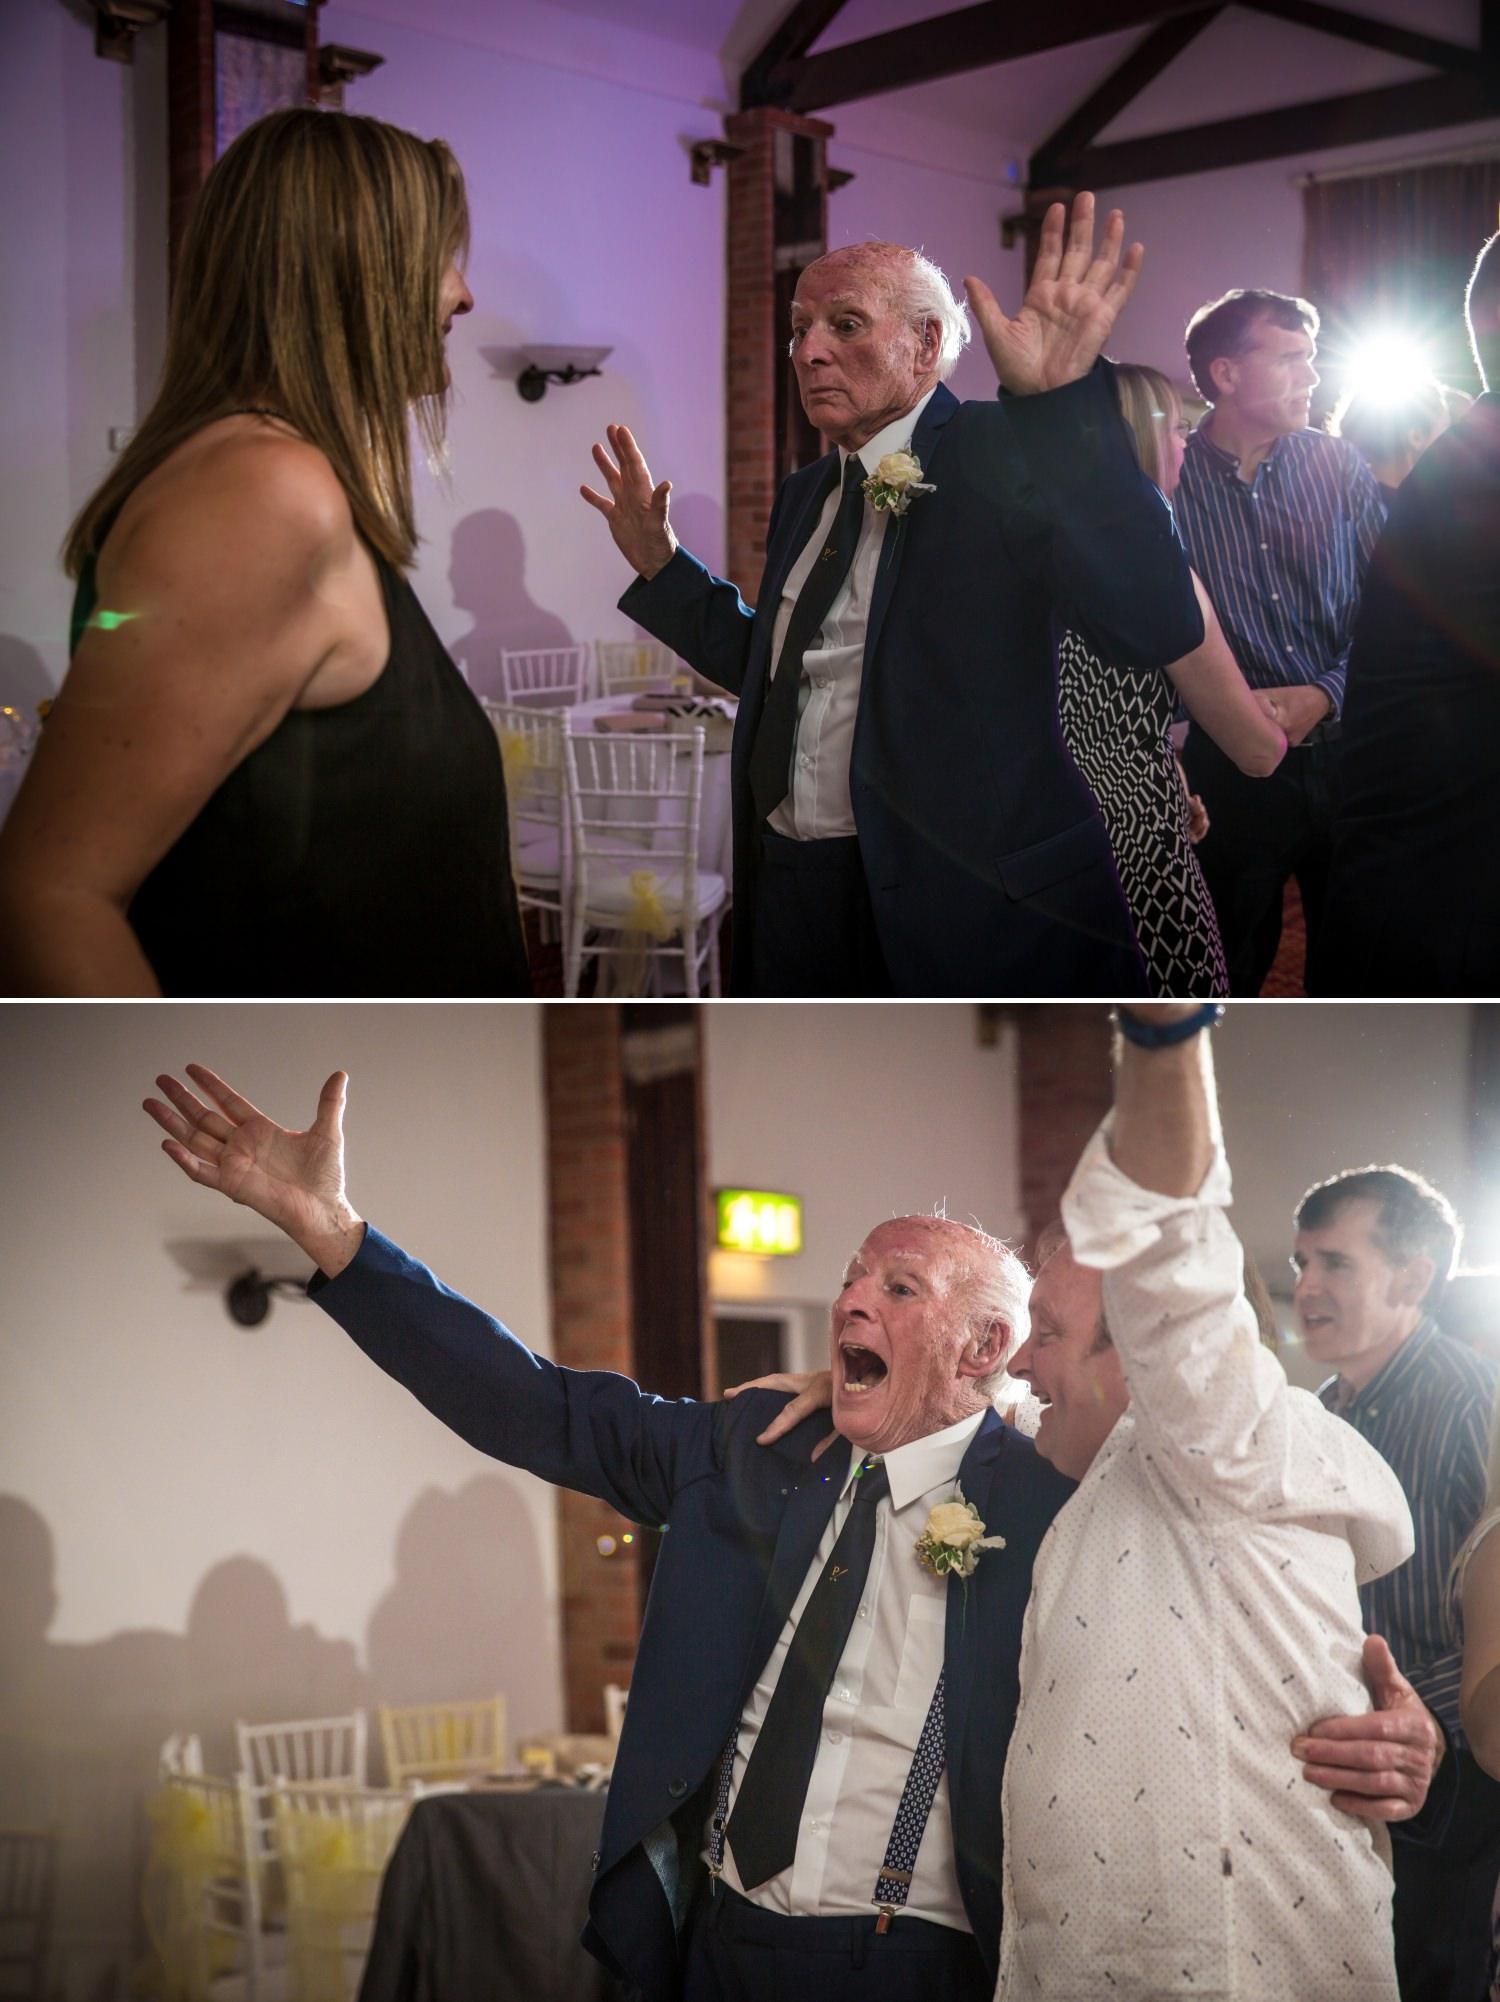 old man dancing Wedding Photograph at Carden Park